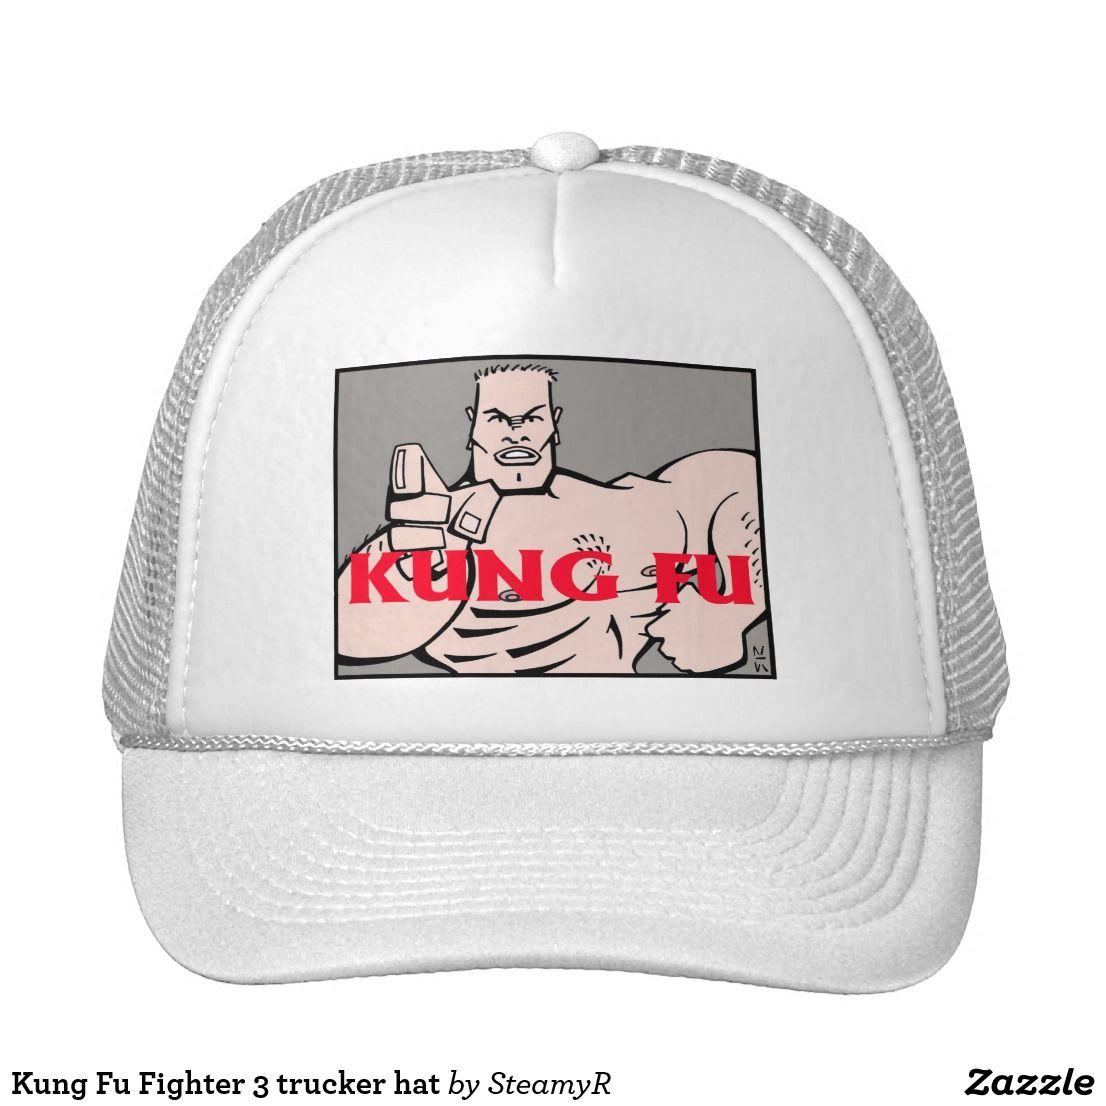 Kung Fu Fighter 3 trucker hat